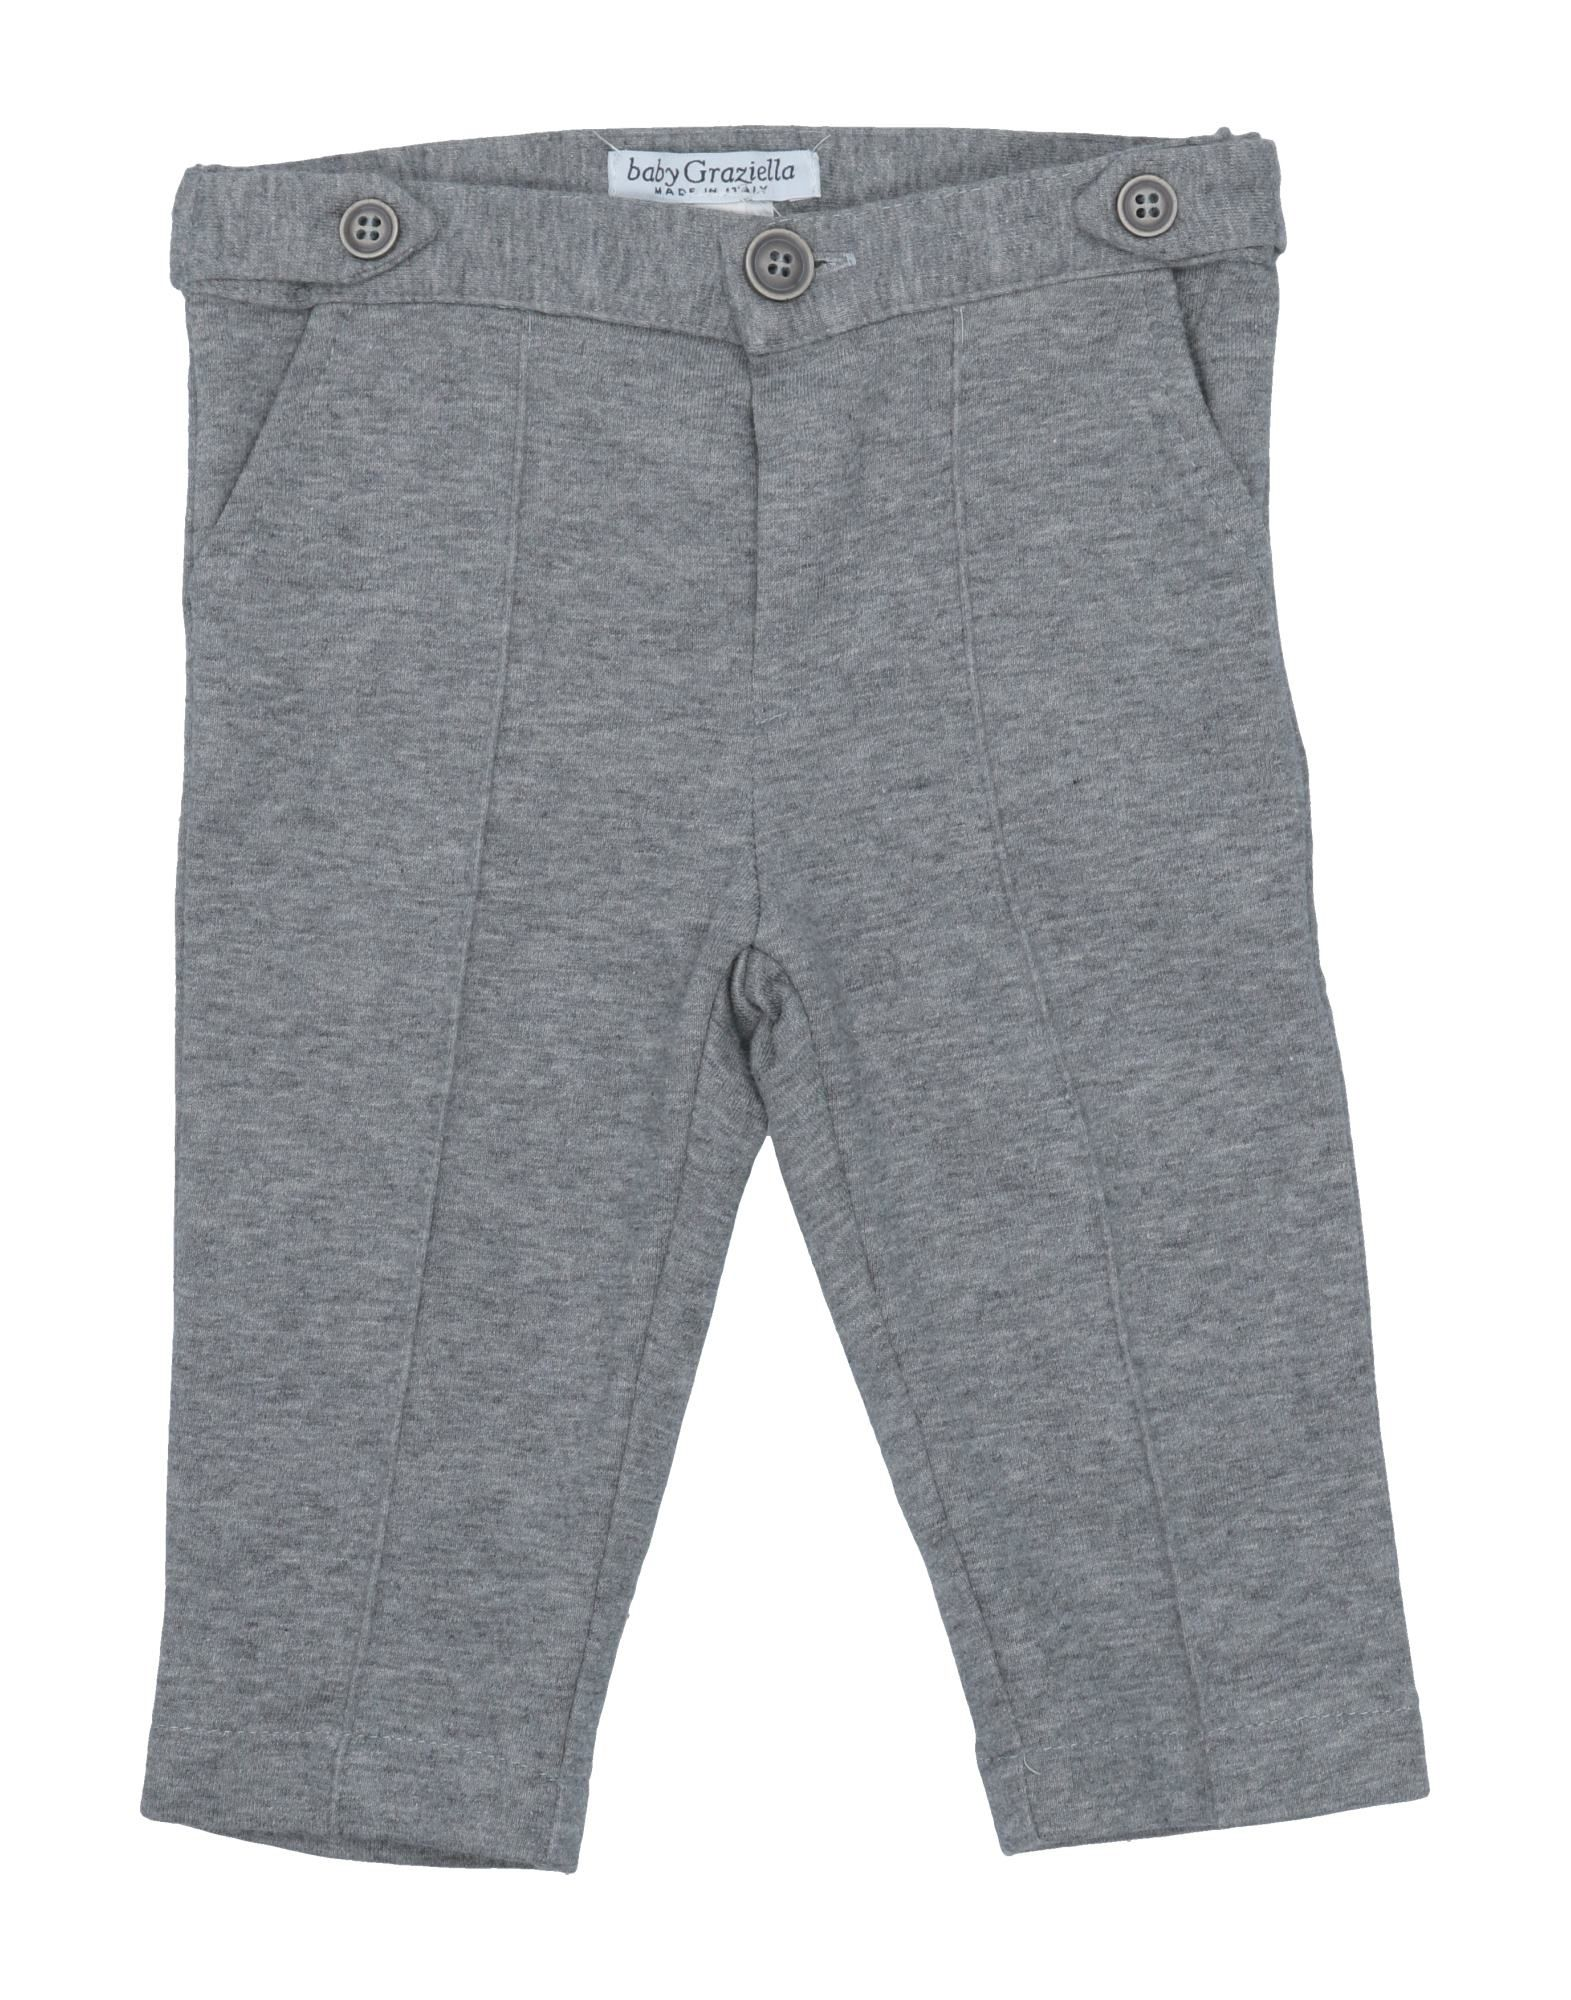 Baby Graziella Kids' Casual Pants In Gray